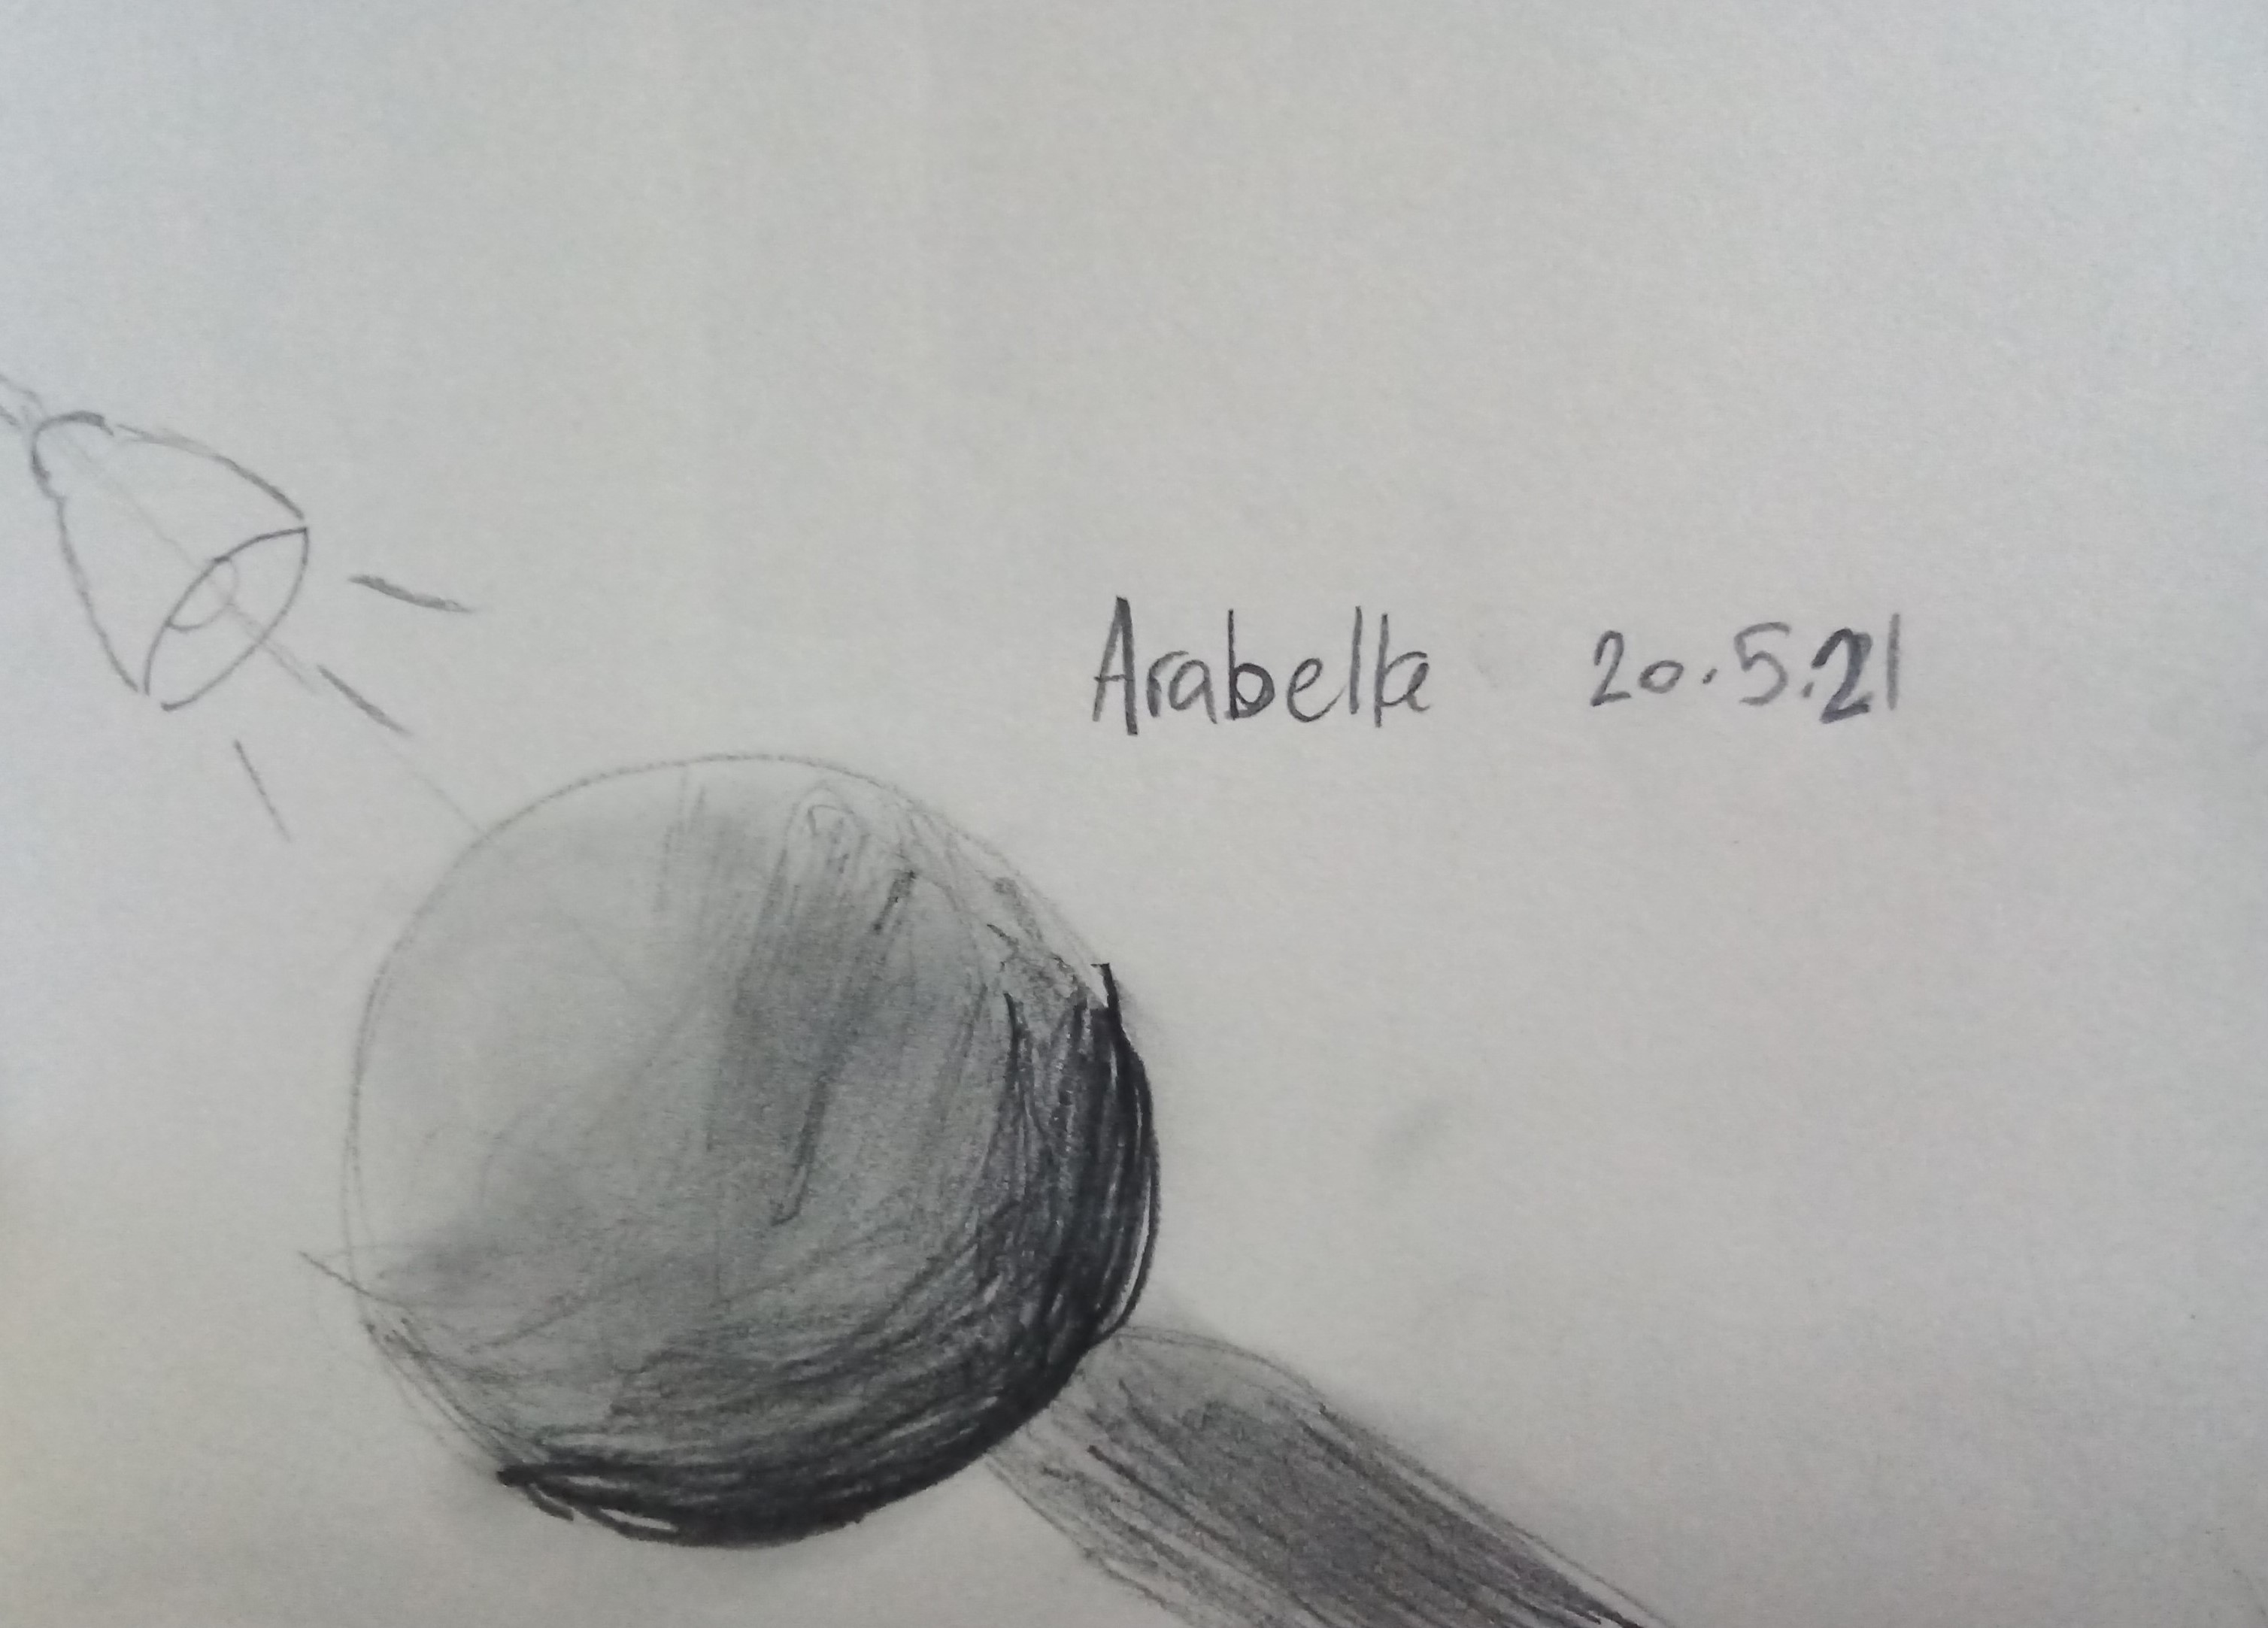 Arabella - Shadows